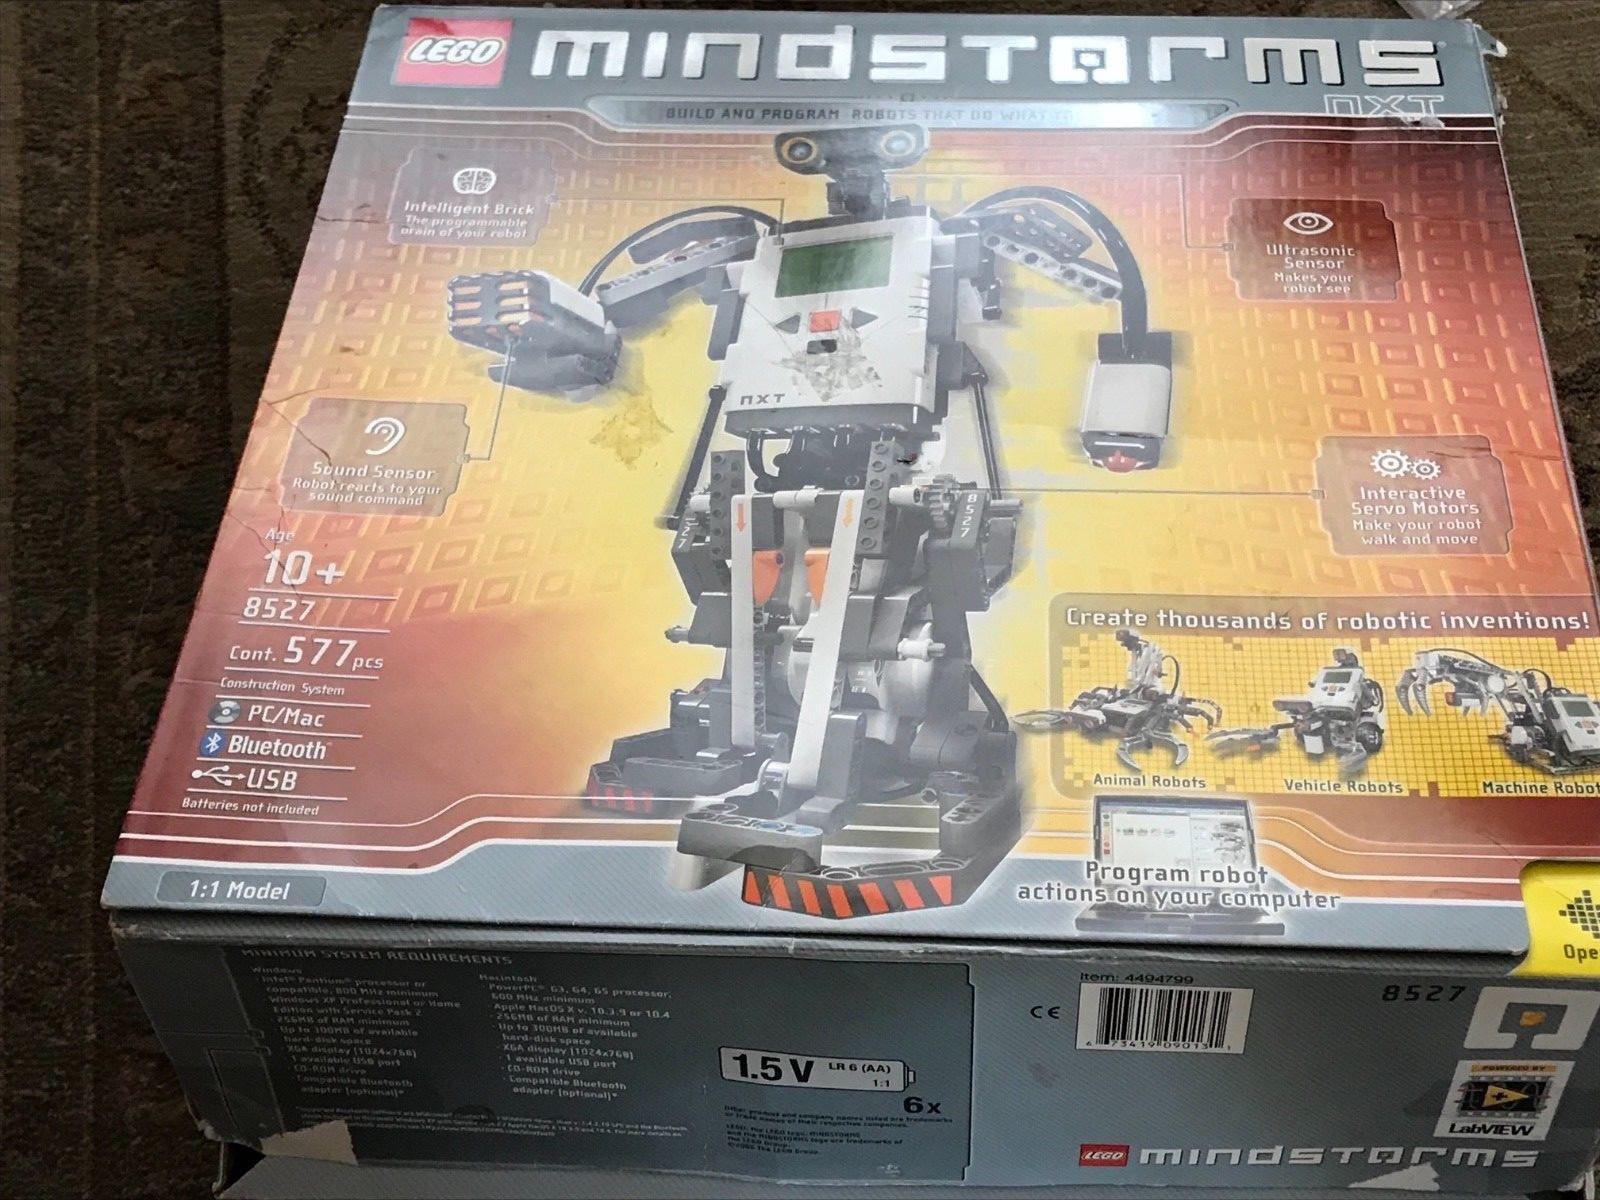 Lego  Mindstorms NXT (8527) Robotics complet  magasin en ligne de sortie